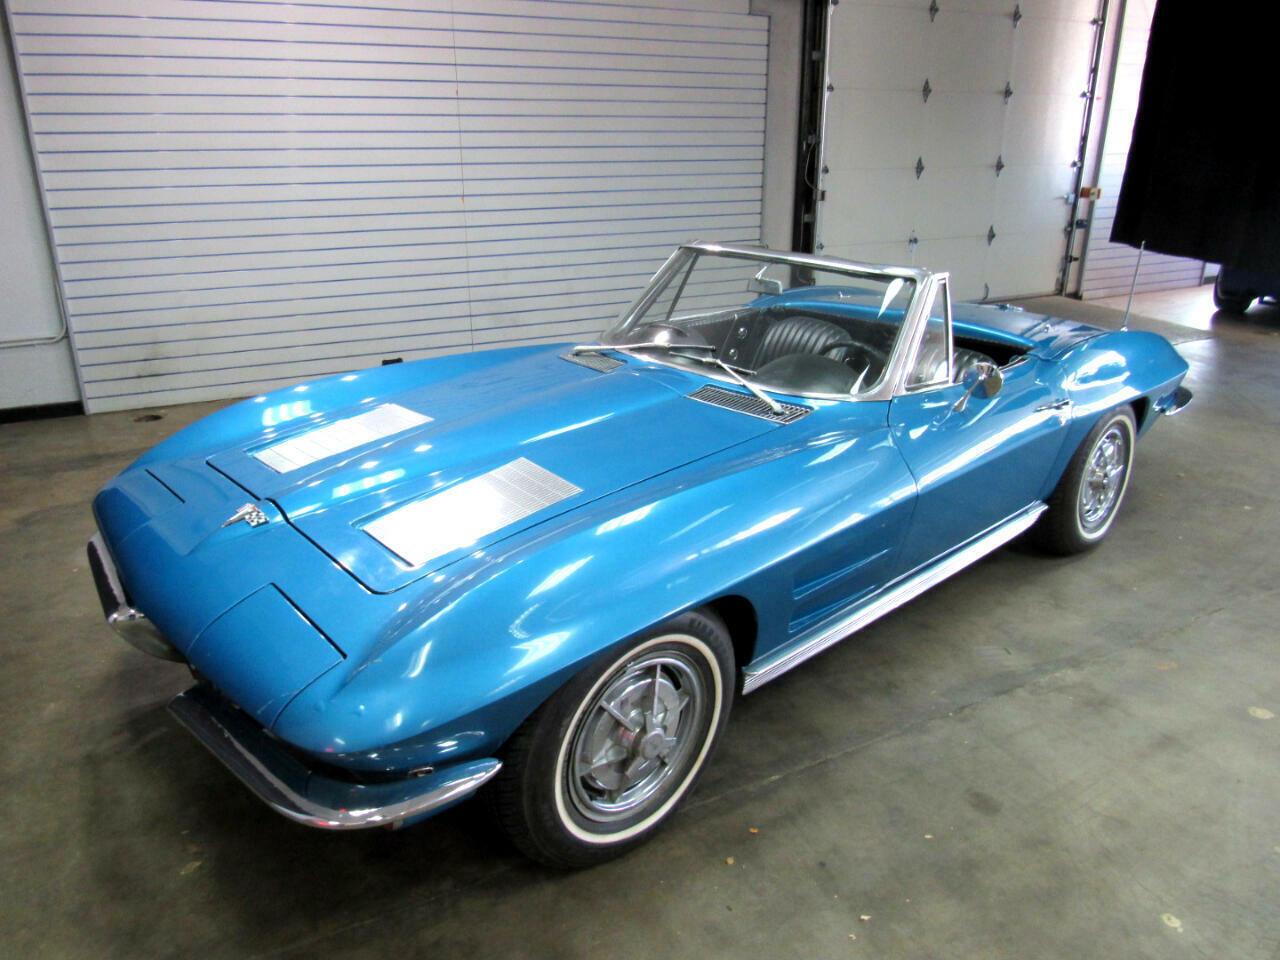 1963 Blue Chevrolet Corvette   | C2 Corvette Photo 1